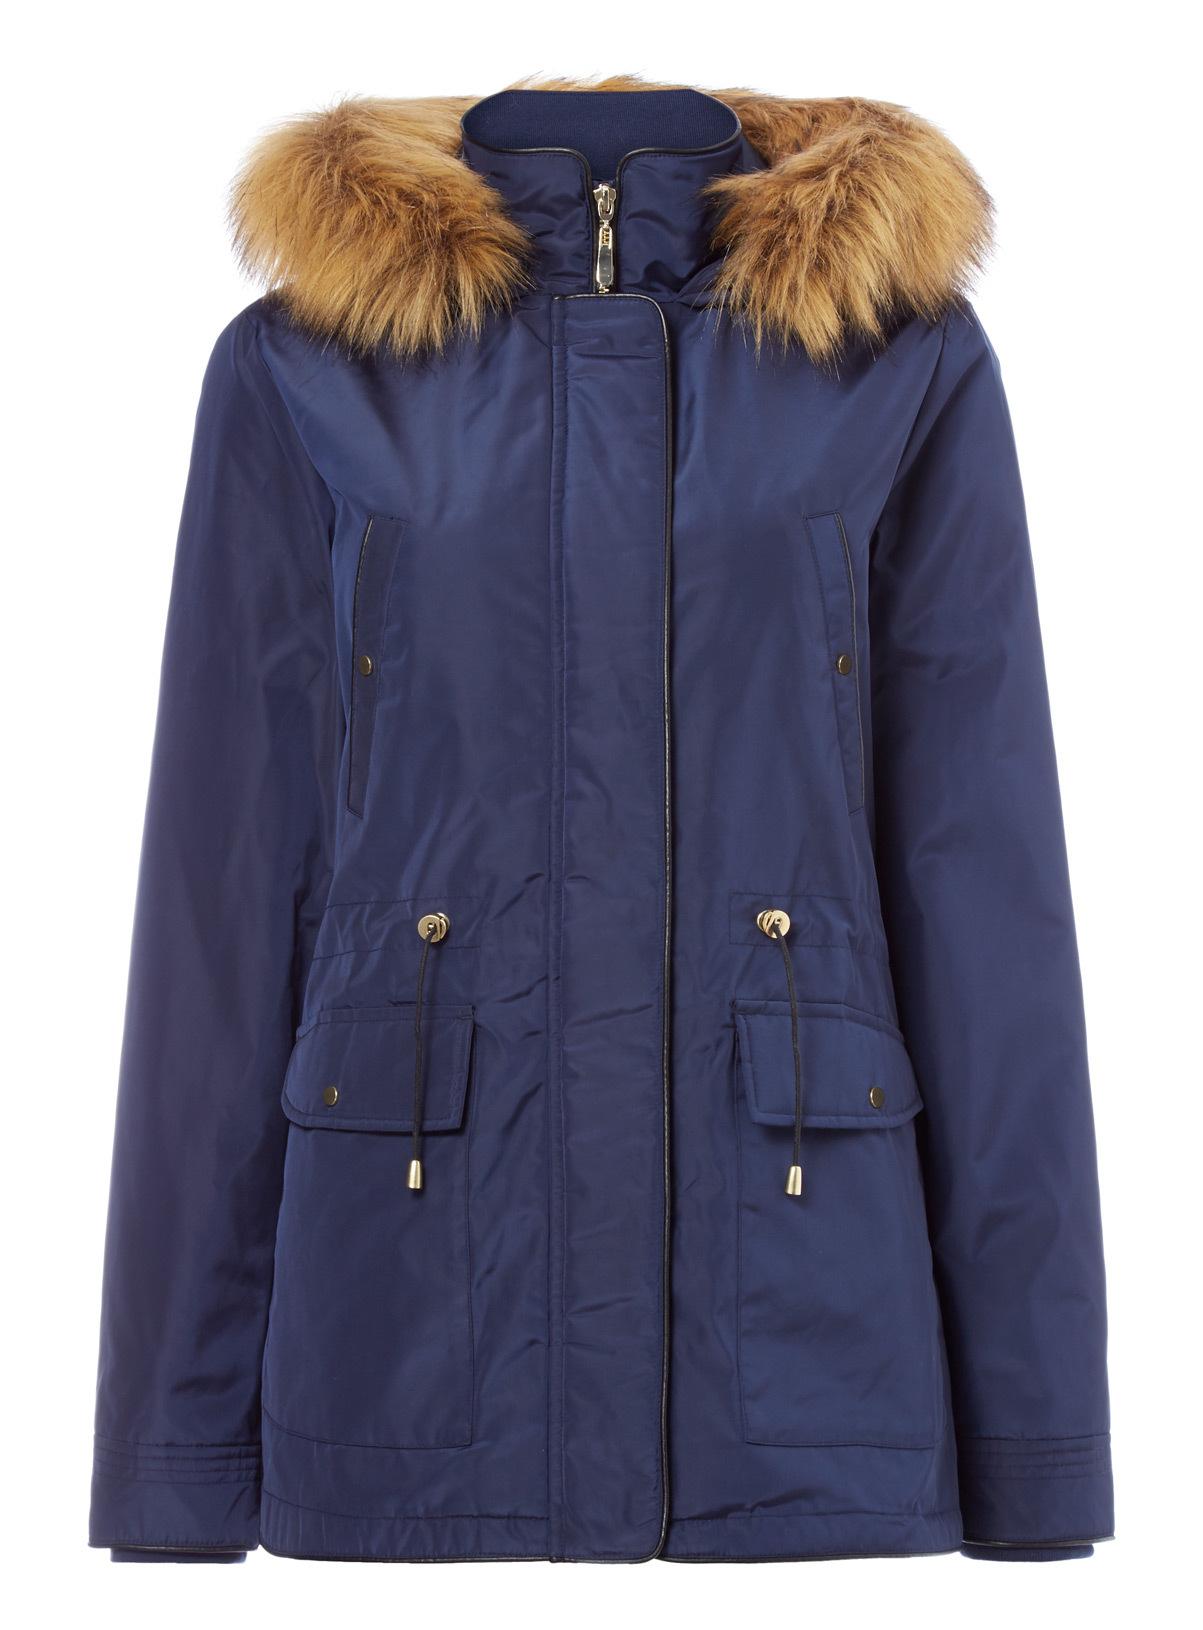 Womens Navy Short Parka Coat | Tu clothing